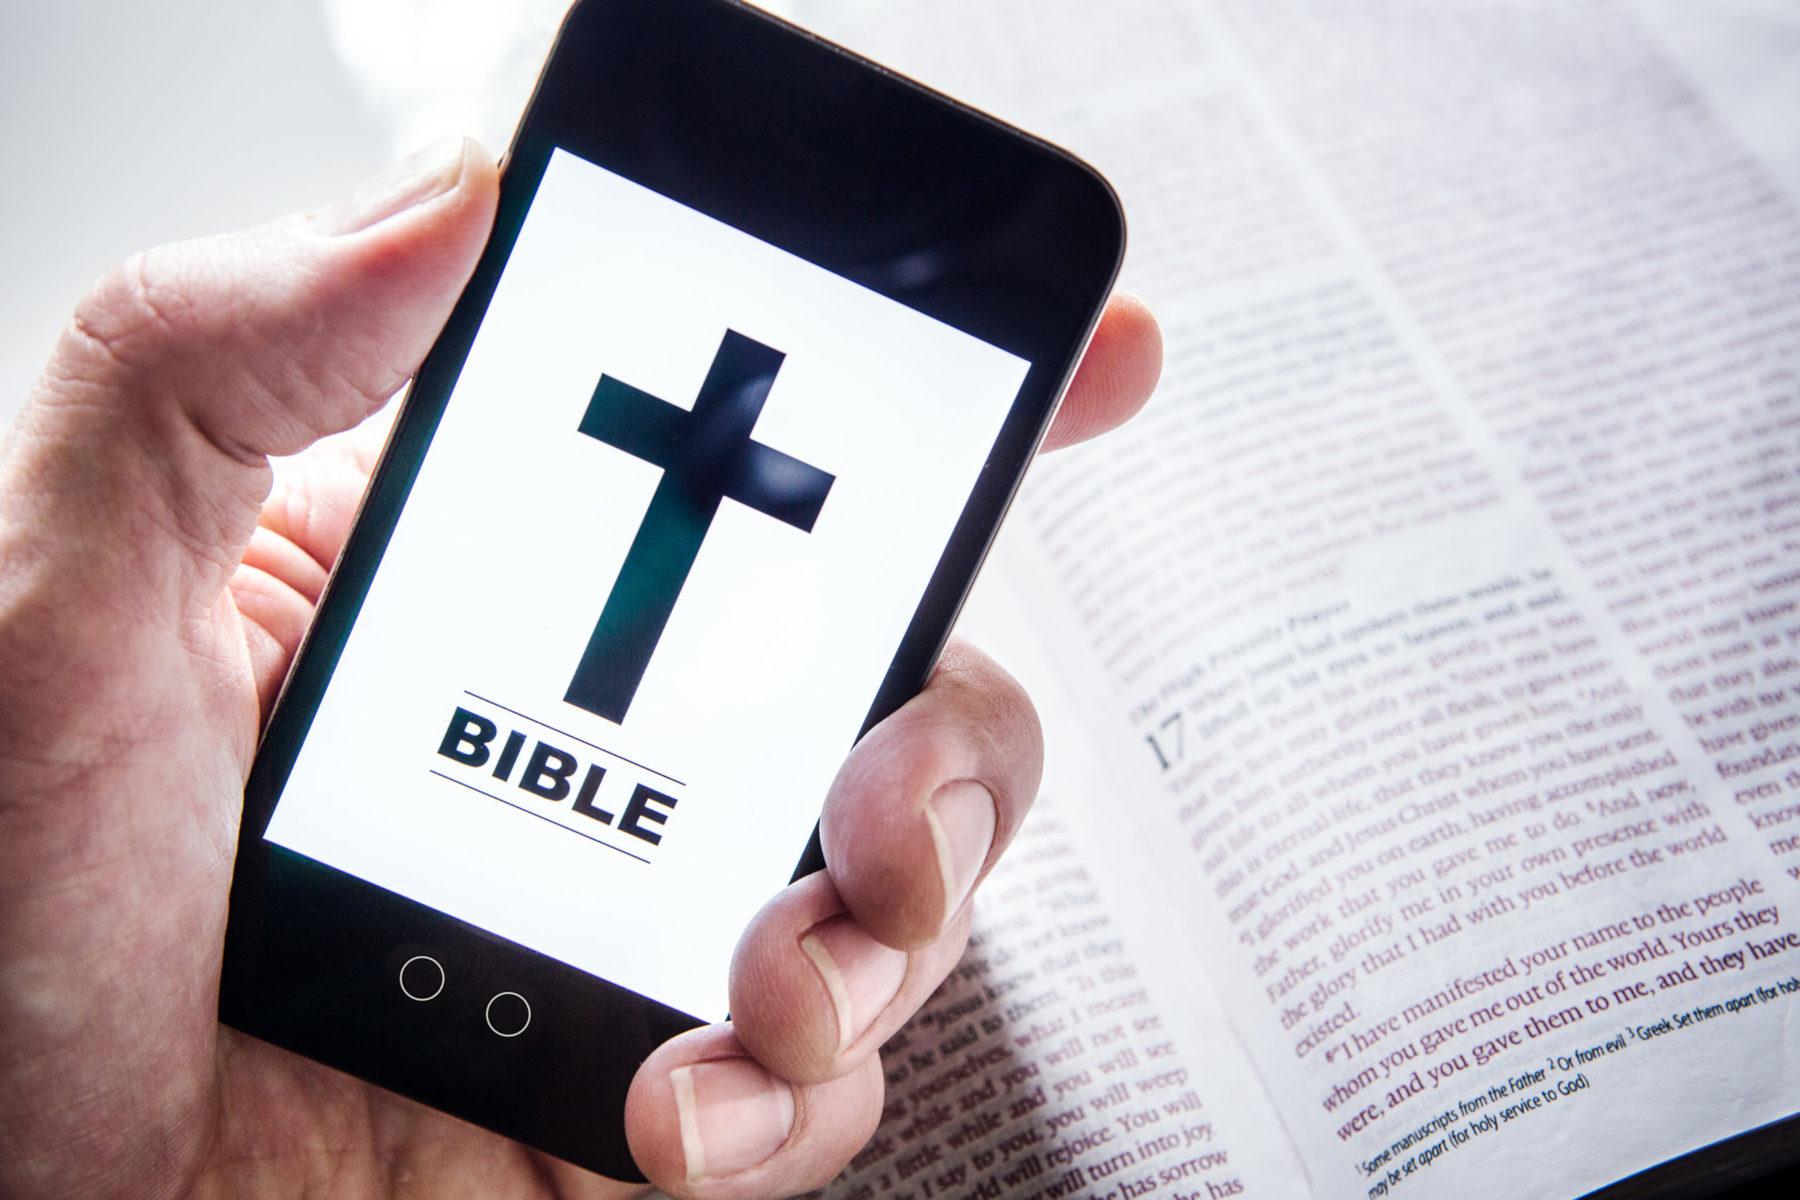 Application Bible en main